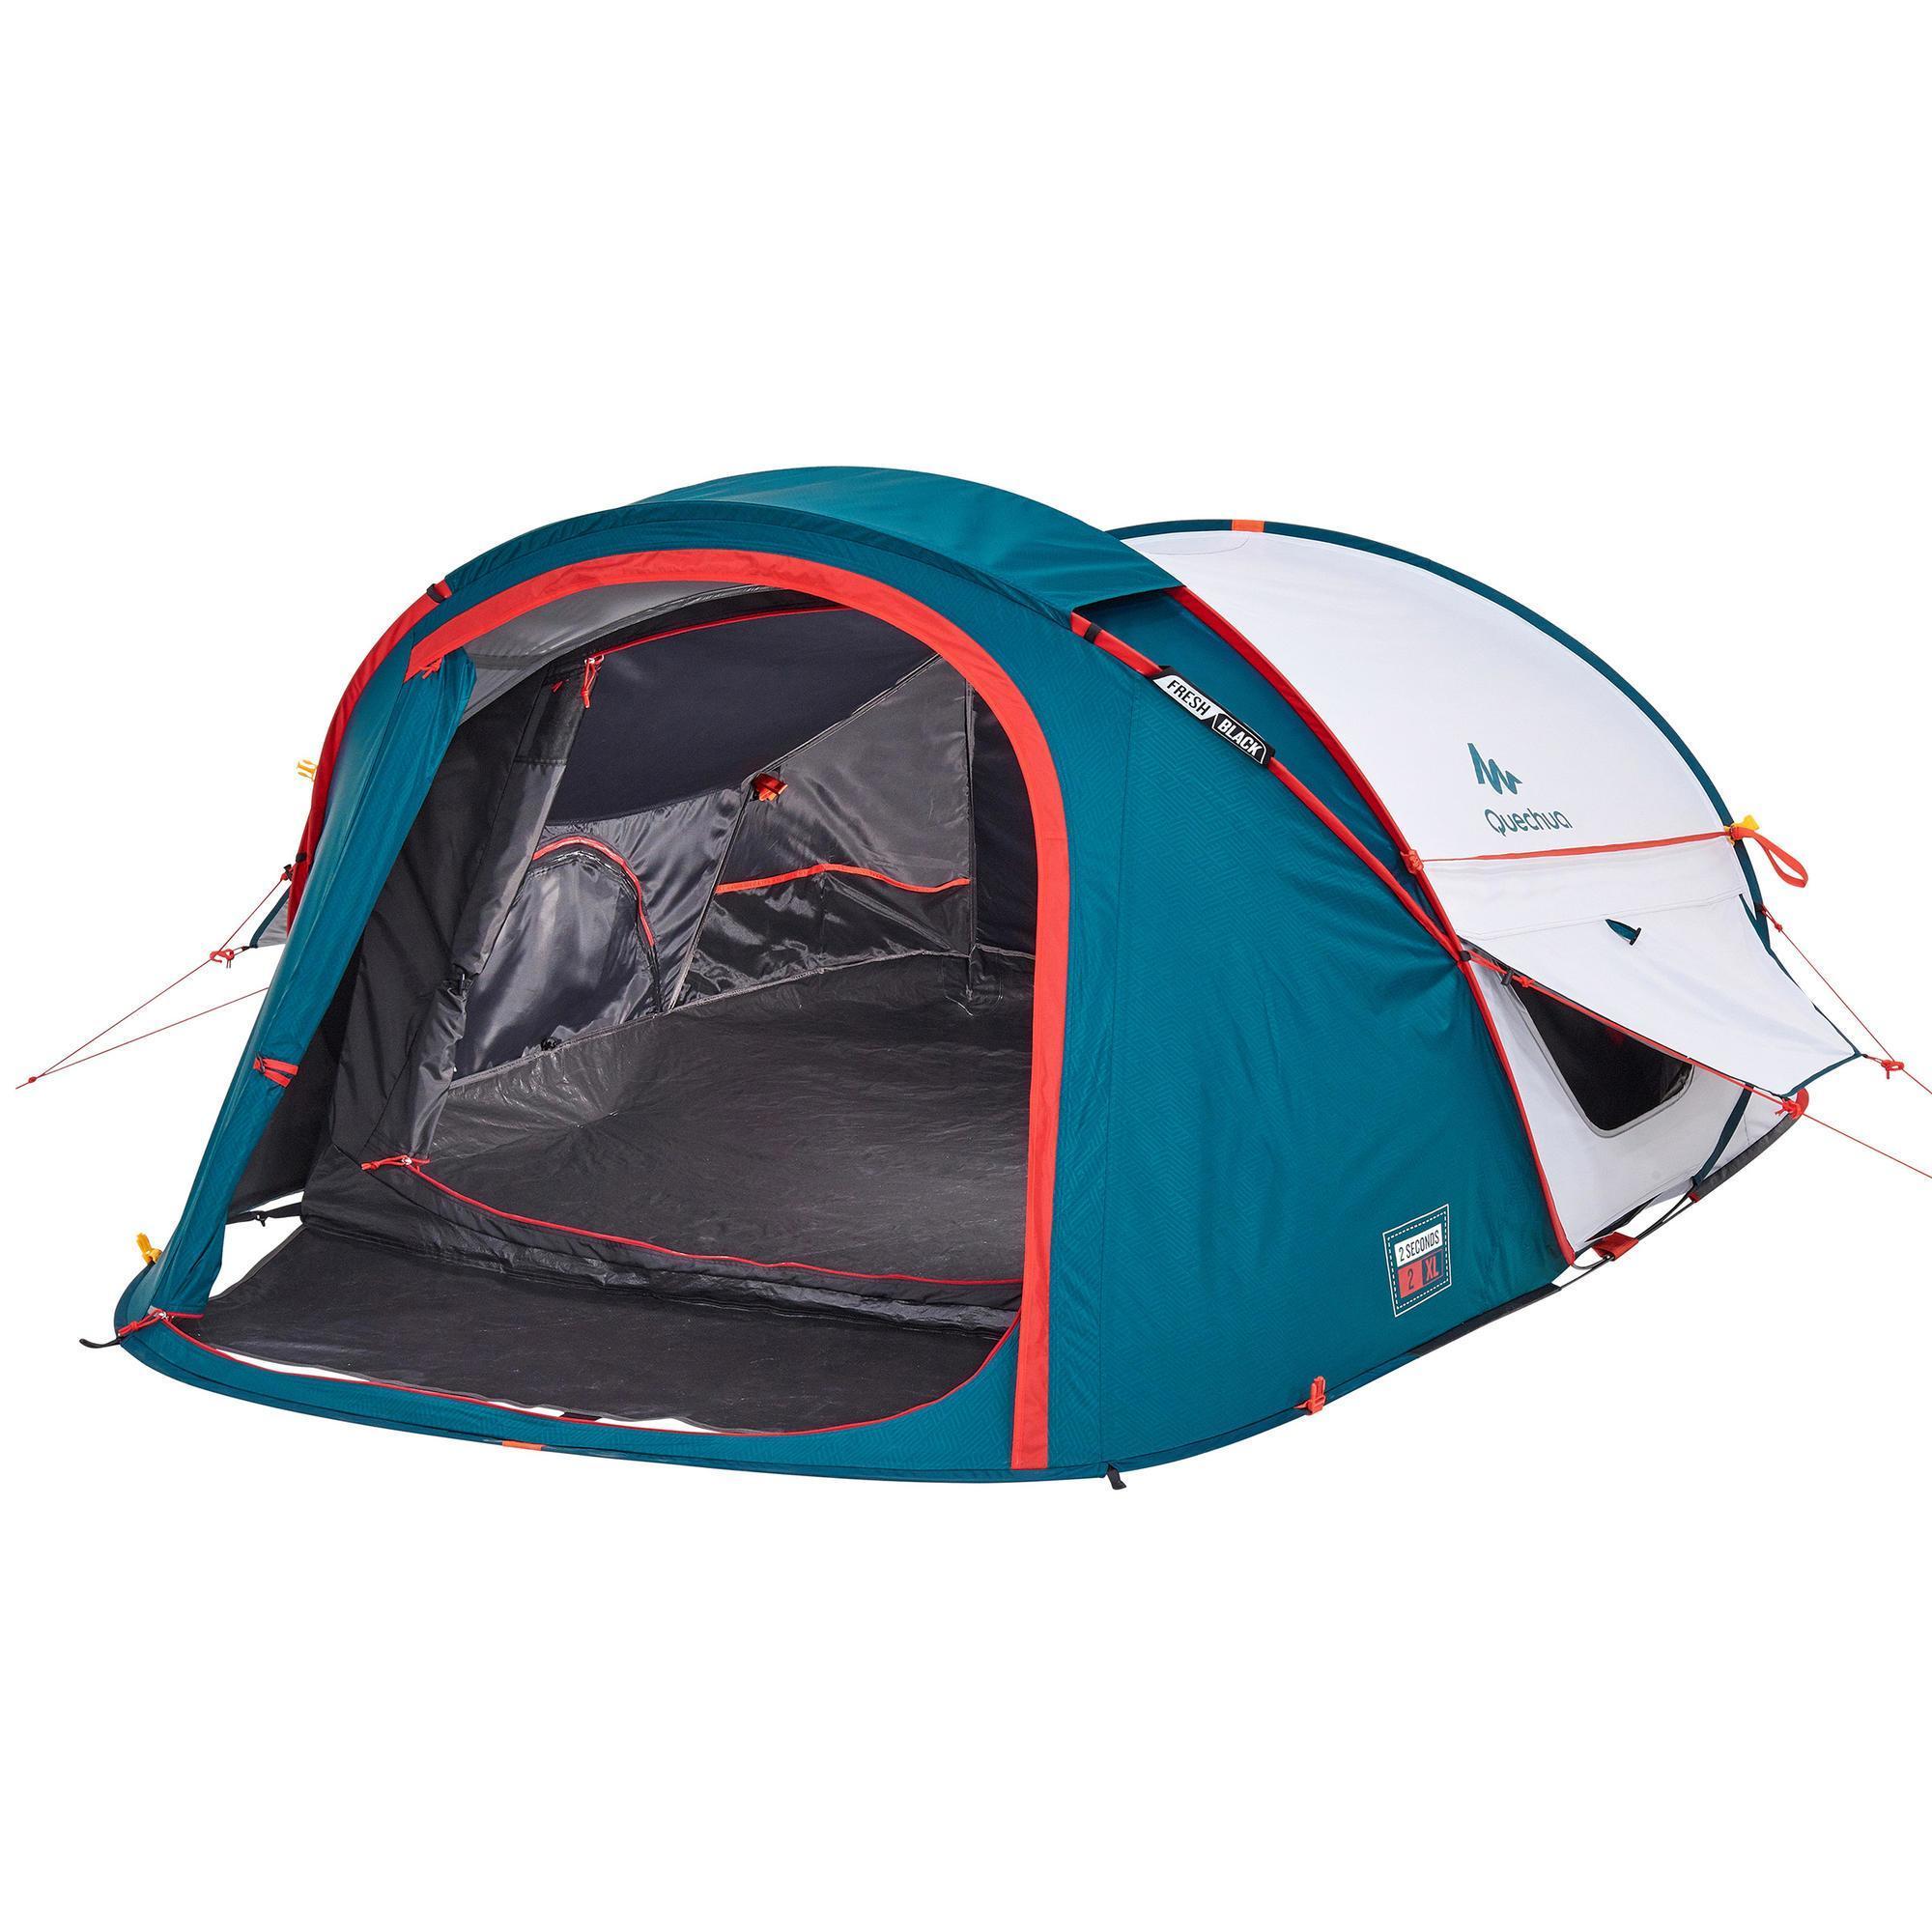 Quechua Pop up tent 2 Seconds 2 XL Fresh & Black 2 personen wit